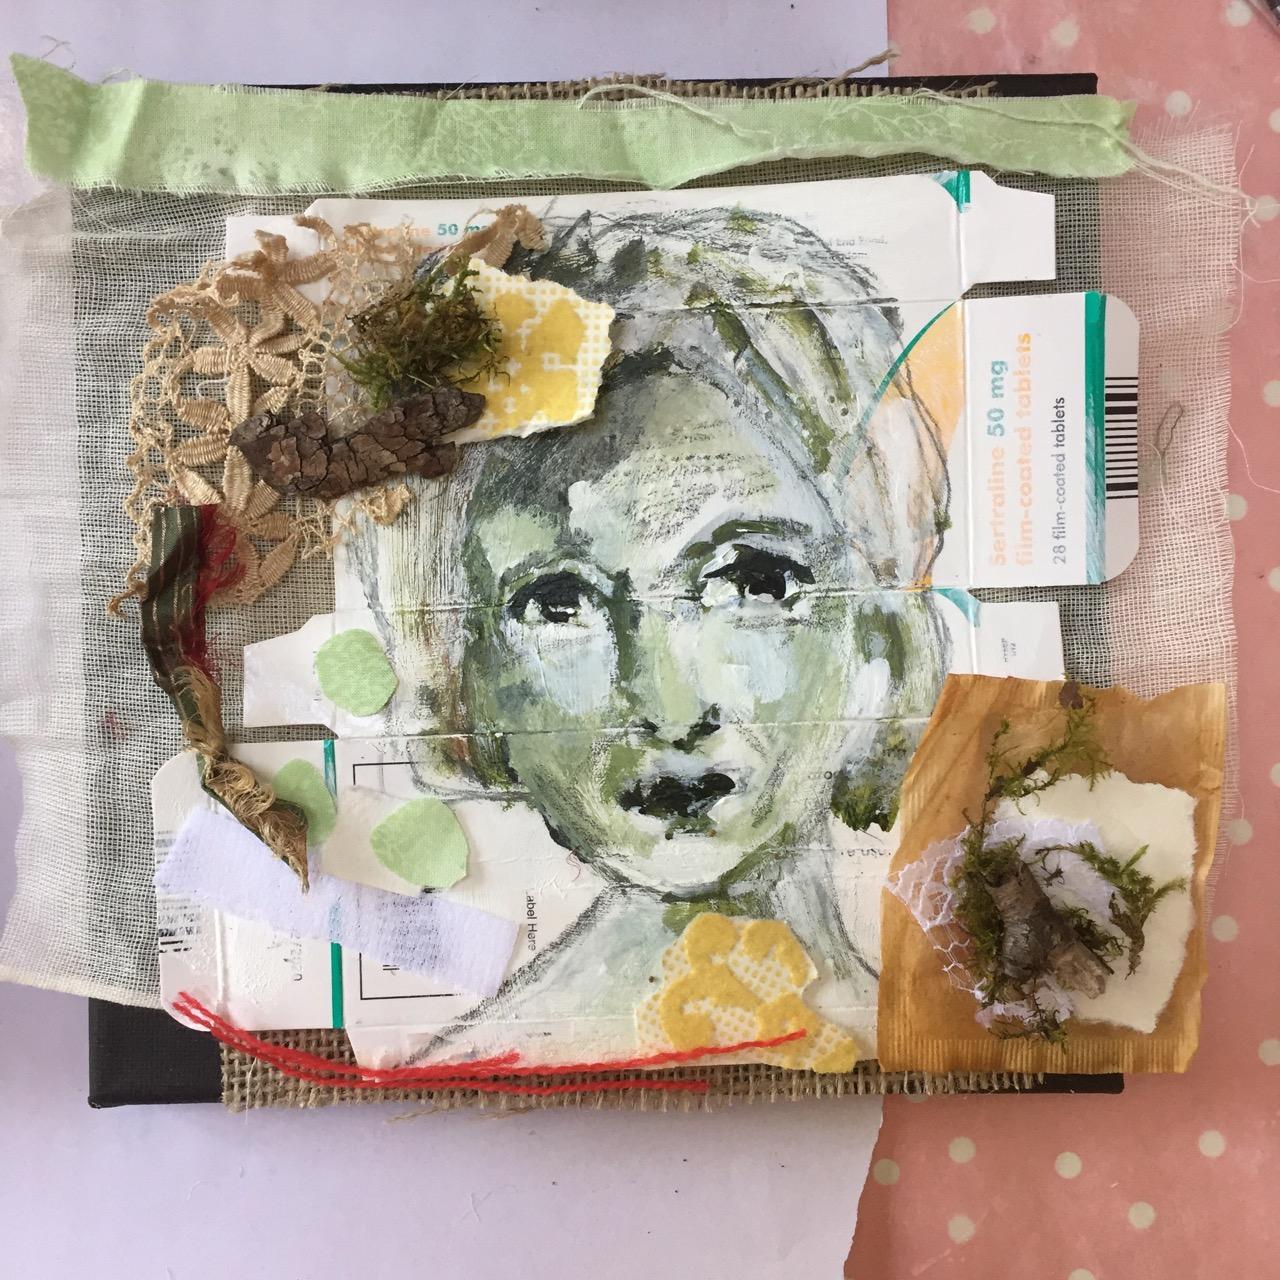 feel-collage-headsup50.jpg